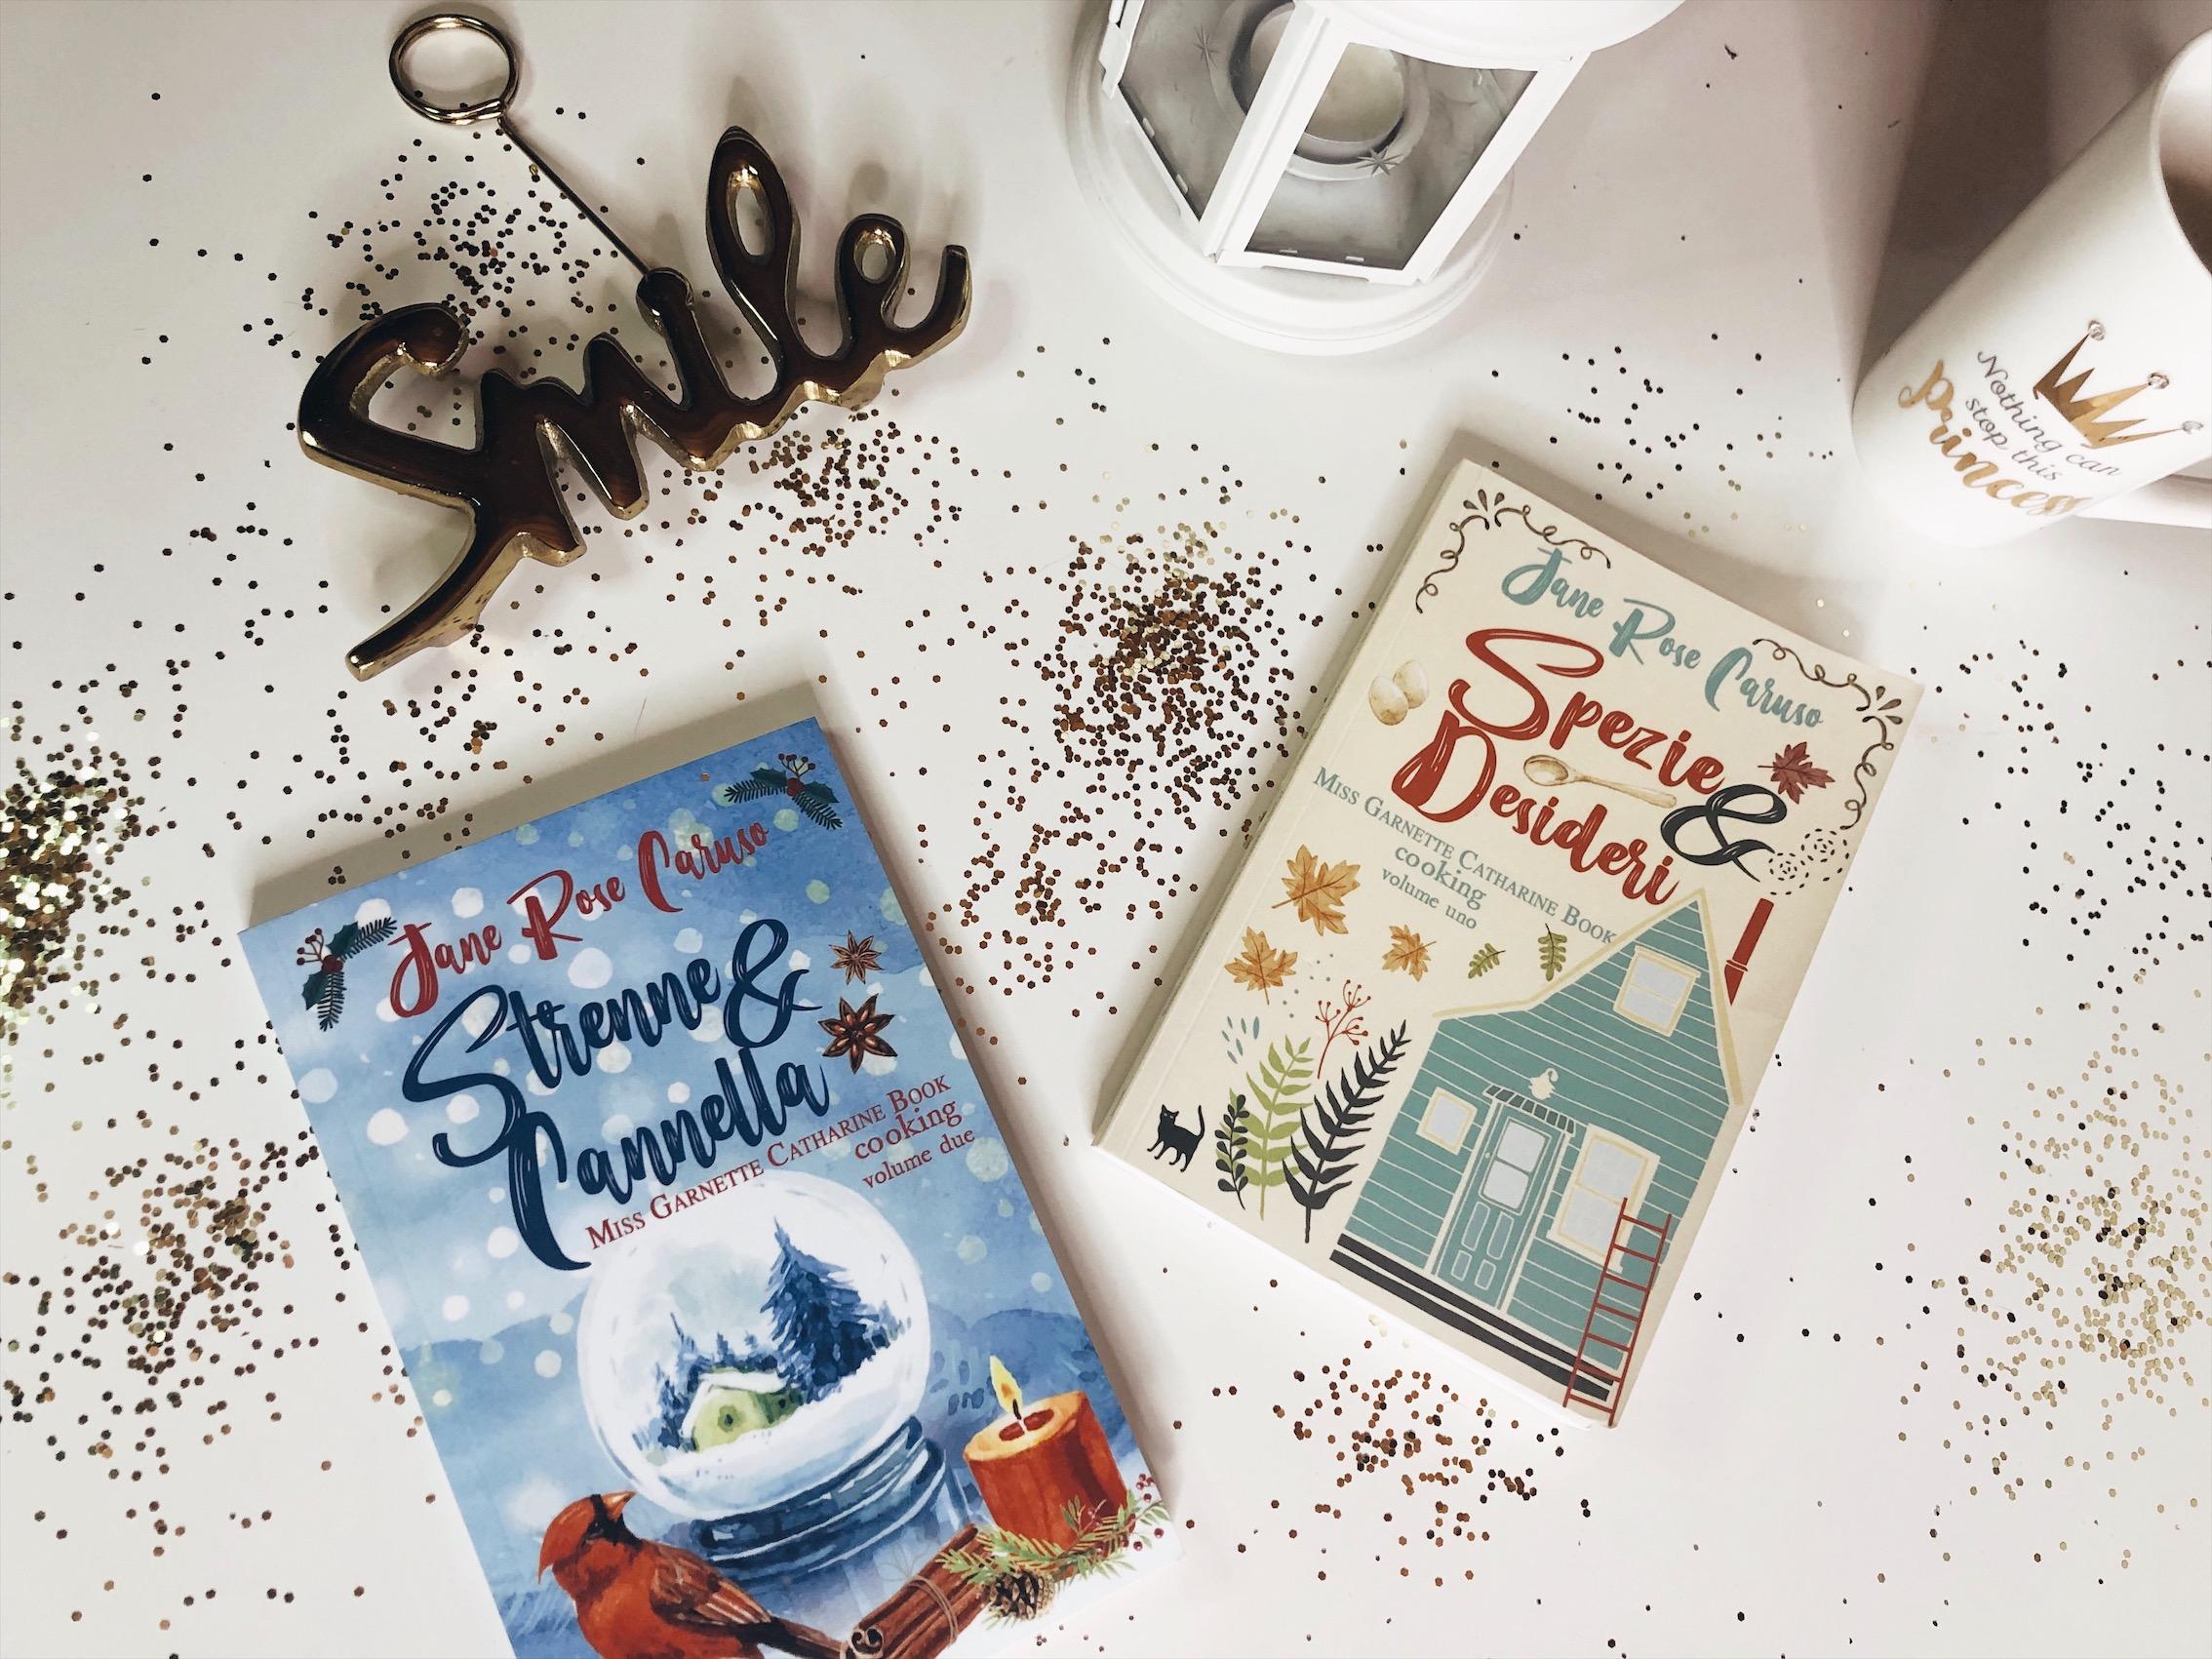 Miss Garnette Catharine Book Cooking di Jane Rose Caruso